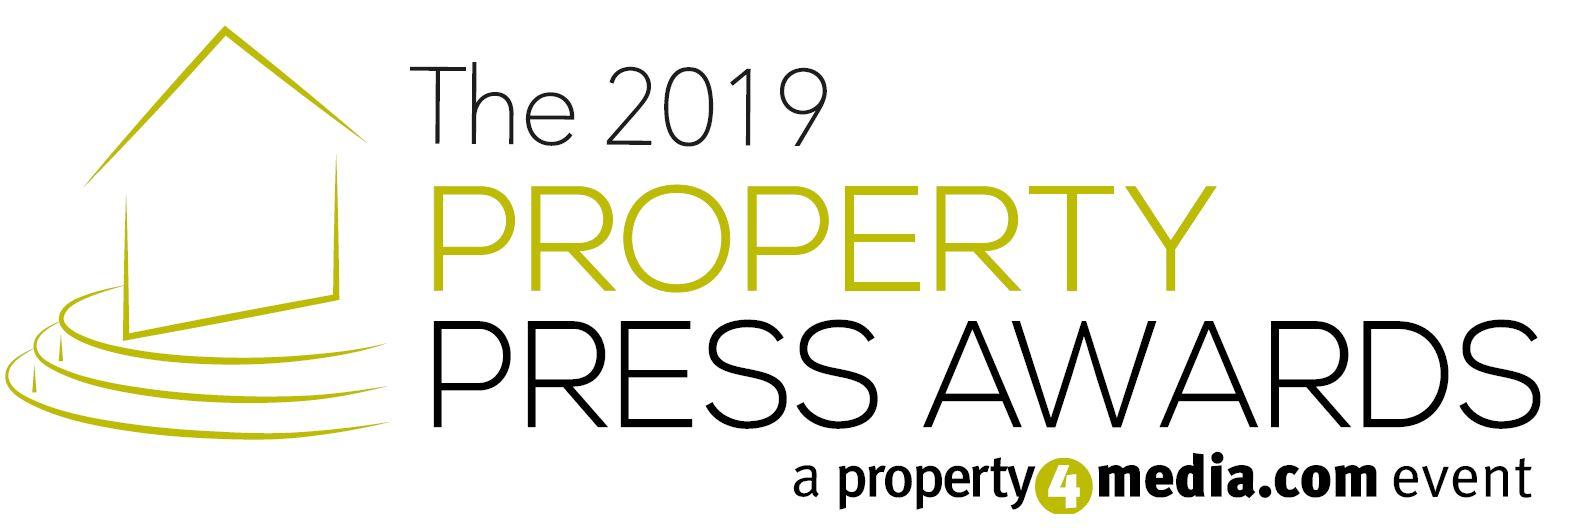 The Property Press Awards 2019